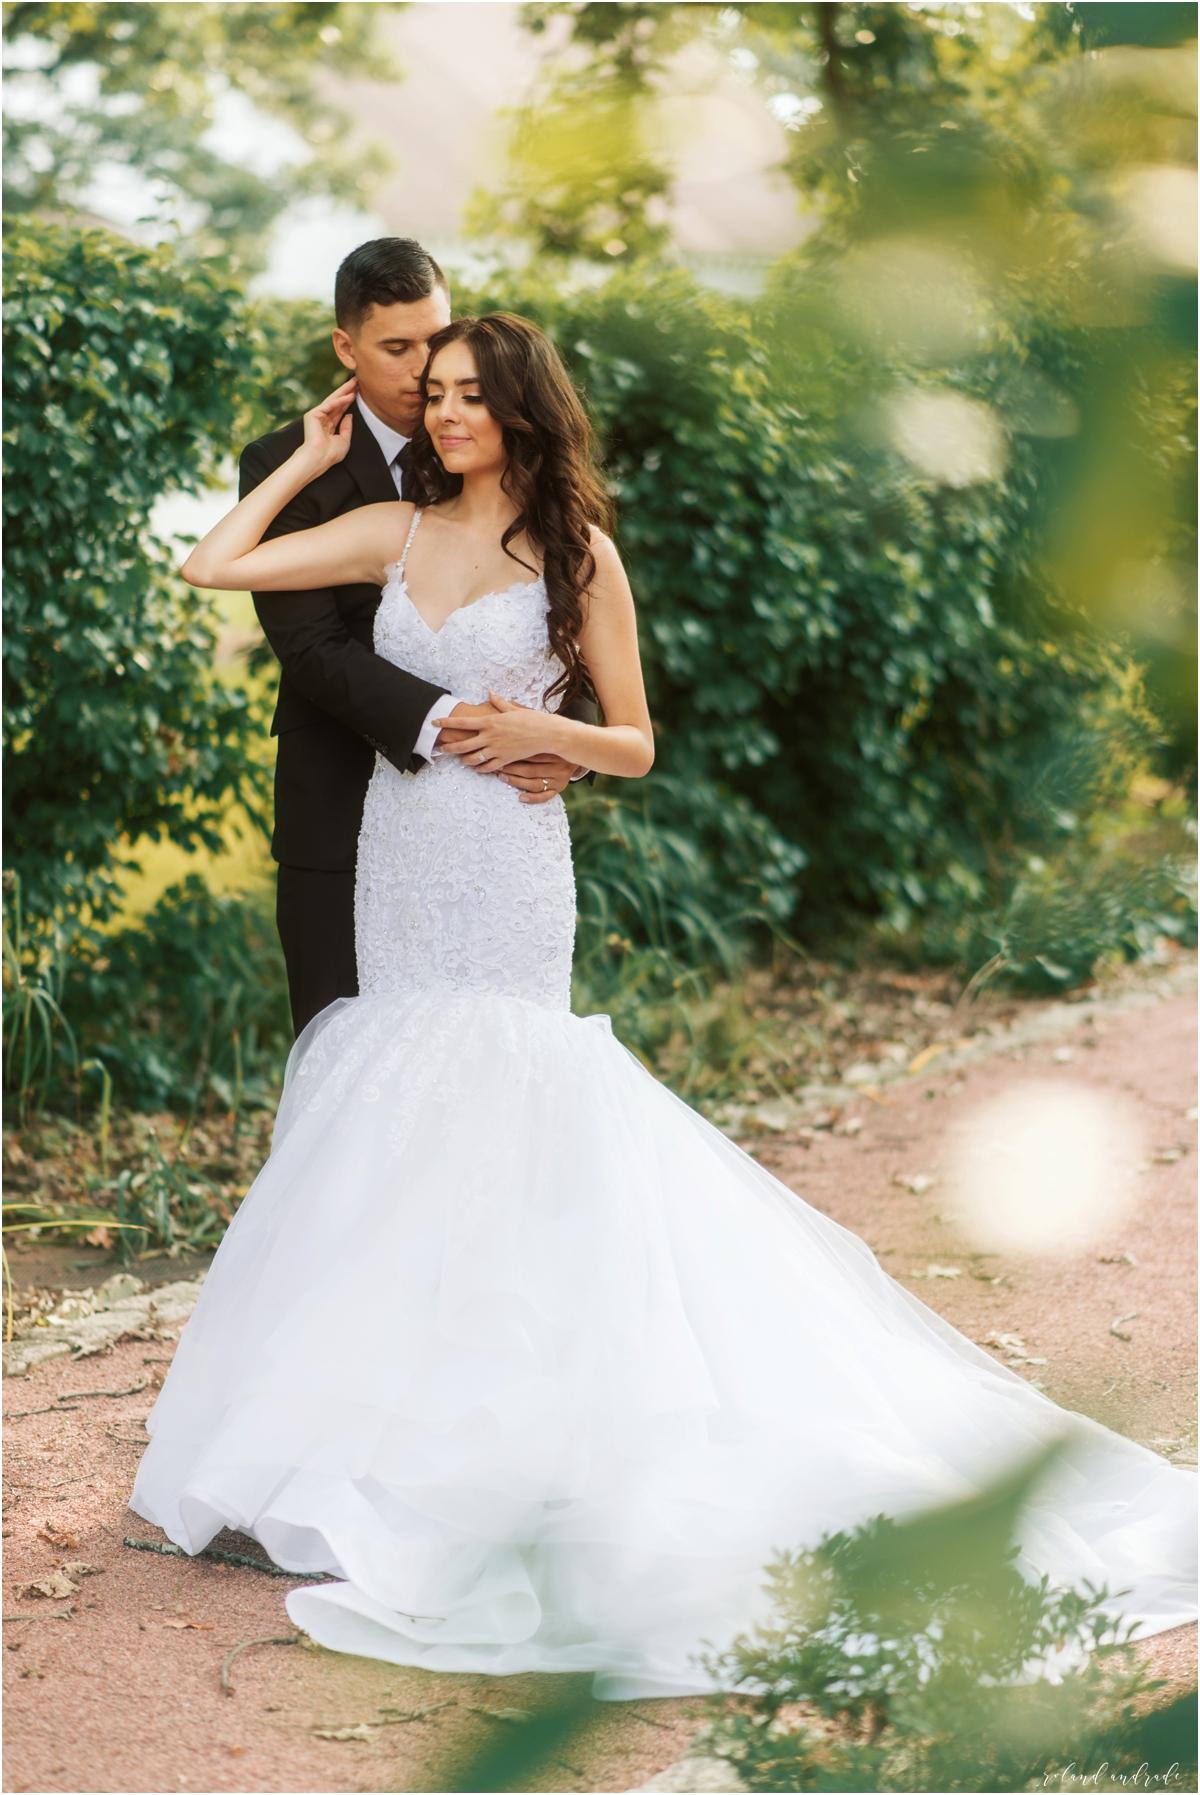 Danada House Wedding Photography Wheaton Illinois - Chicago Wedding Photography_0066.jpg